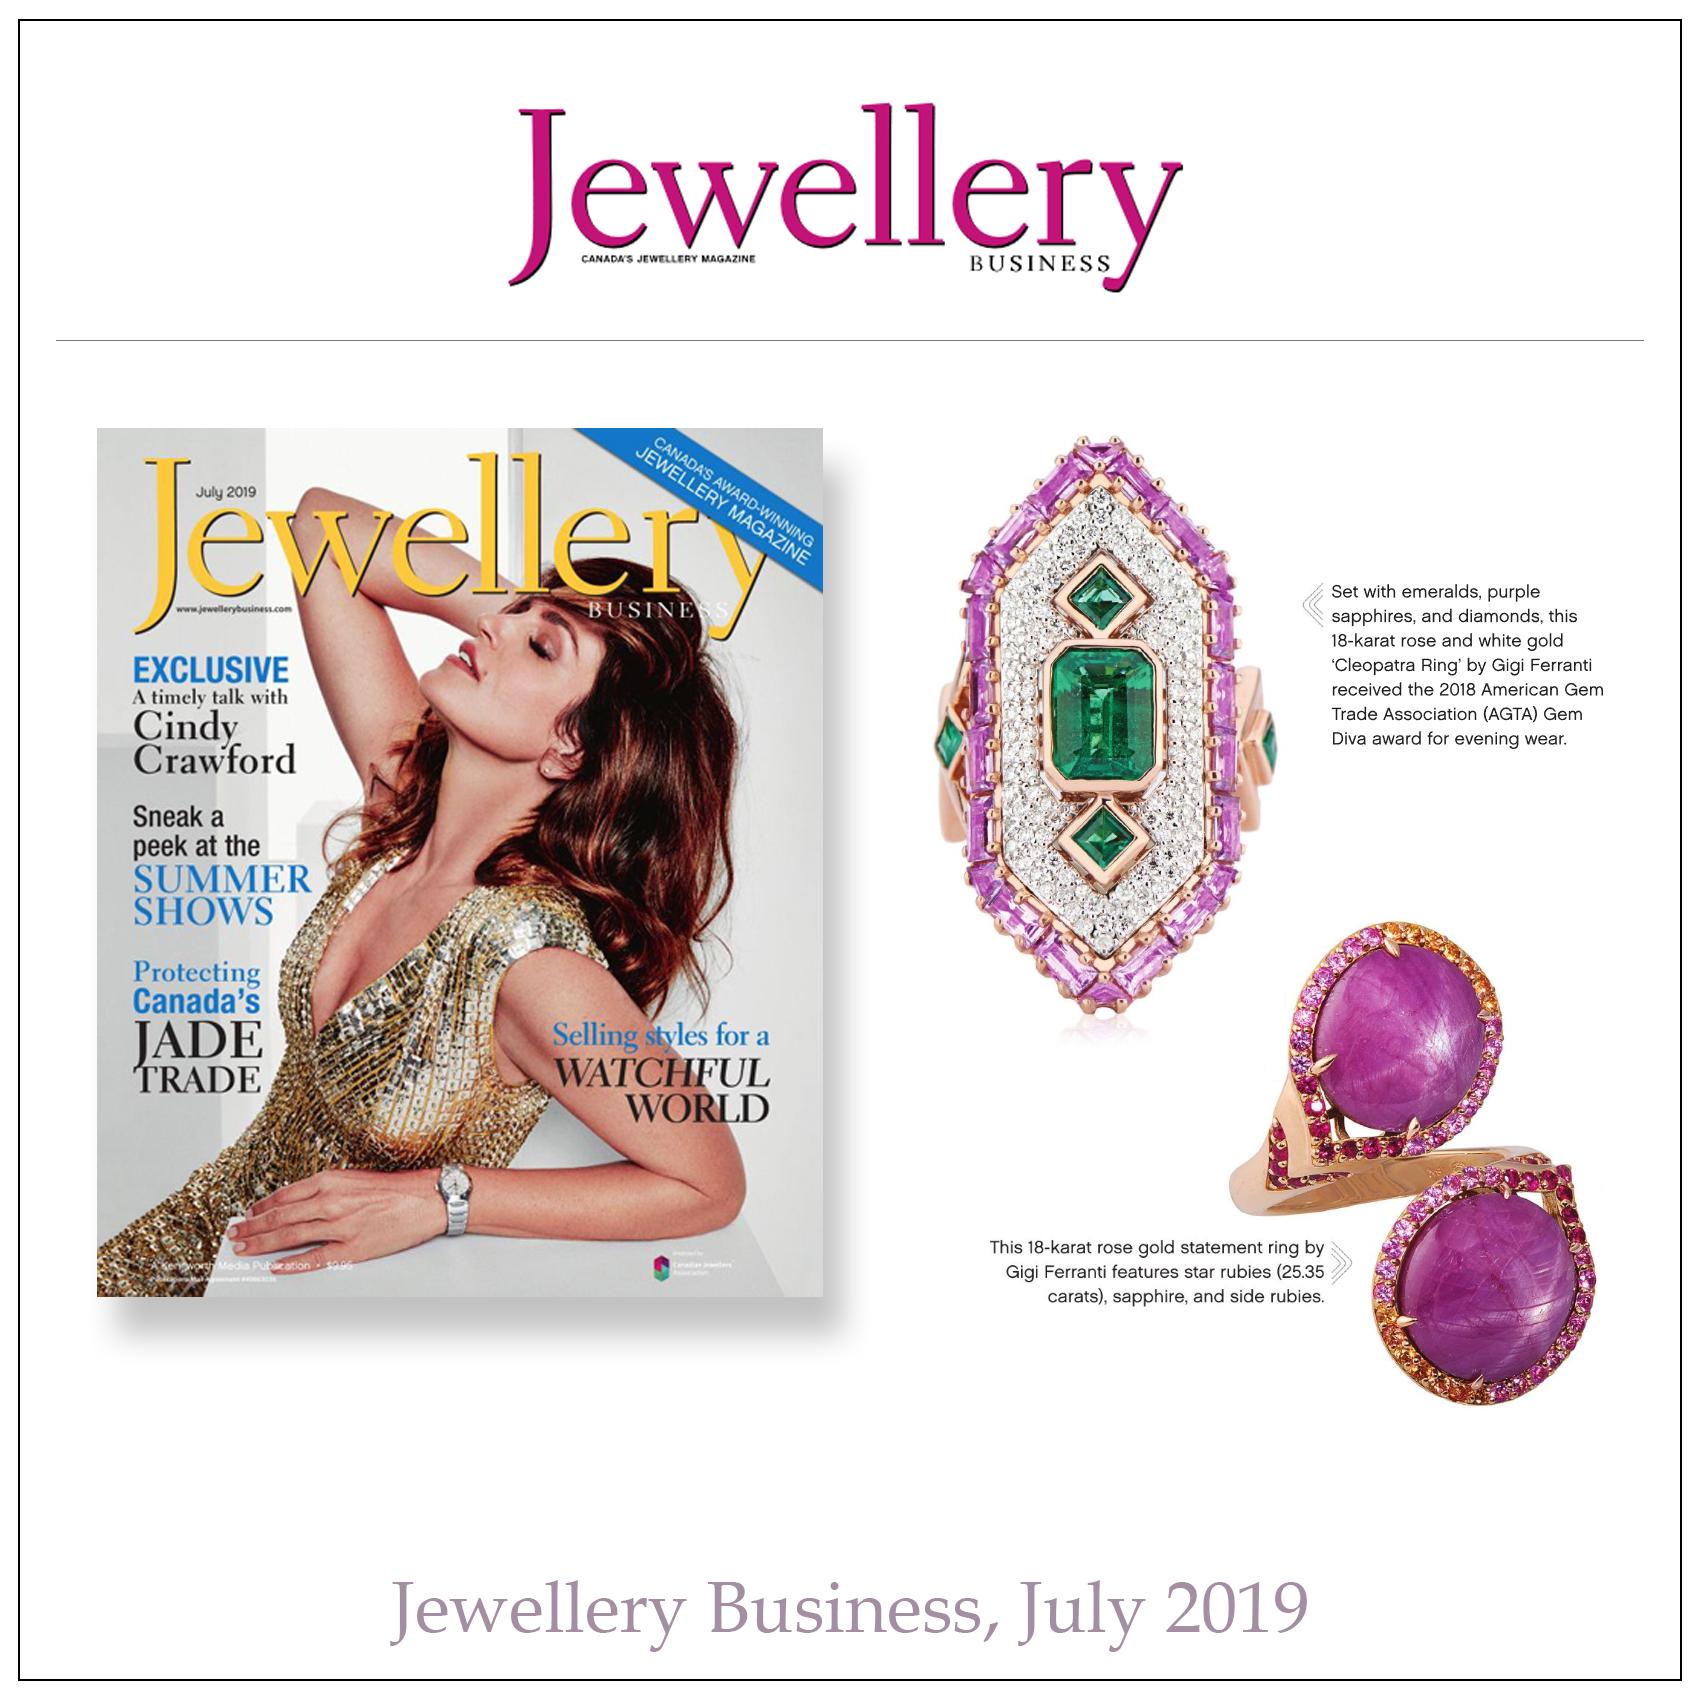 jewellery-businessmagazine-july-2019.png